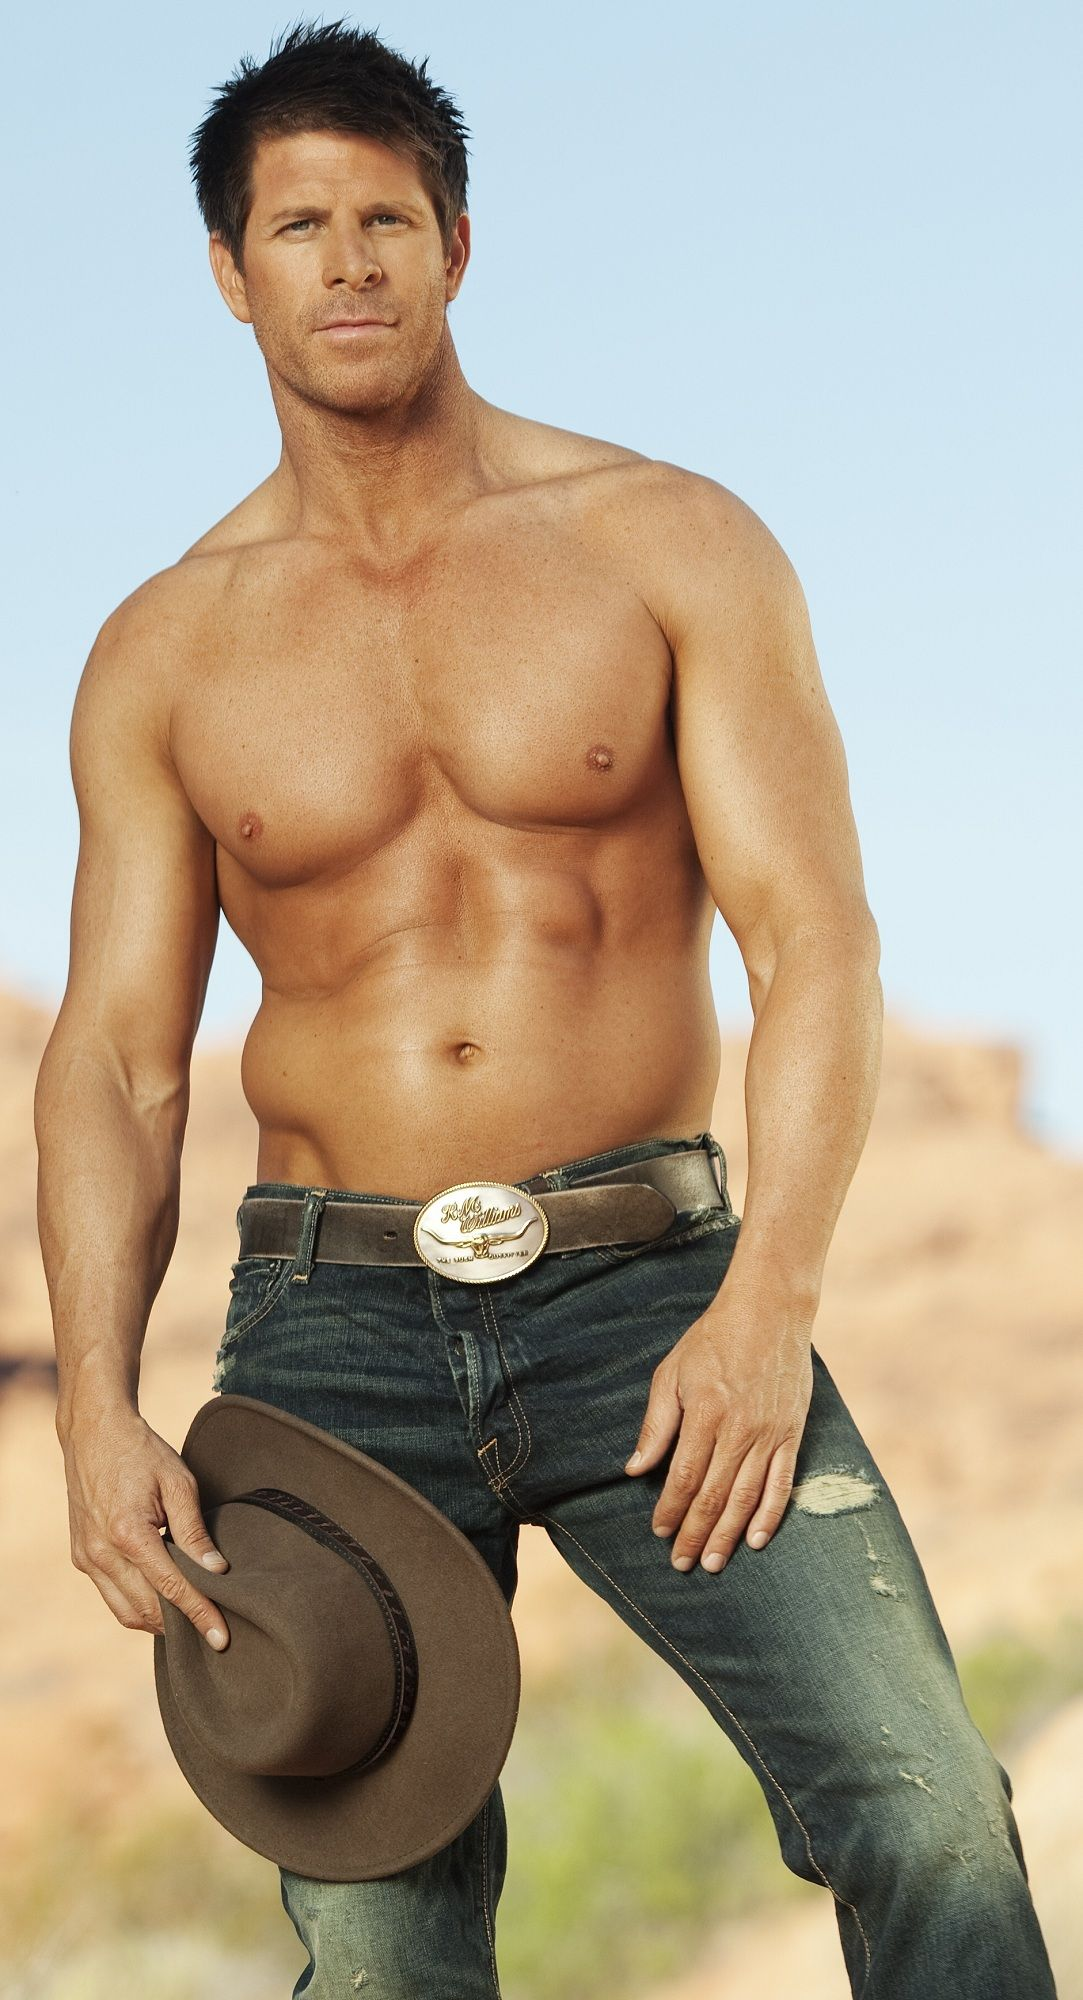 from Nikolai gay cowboy dancers